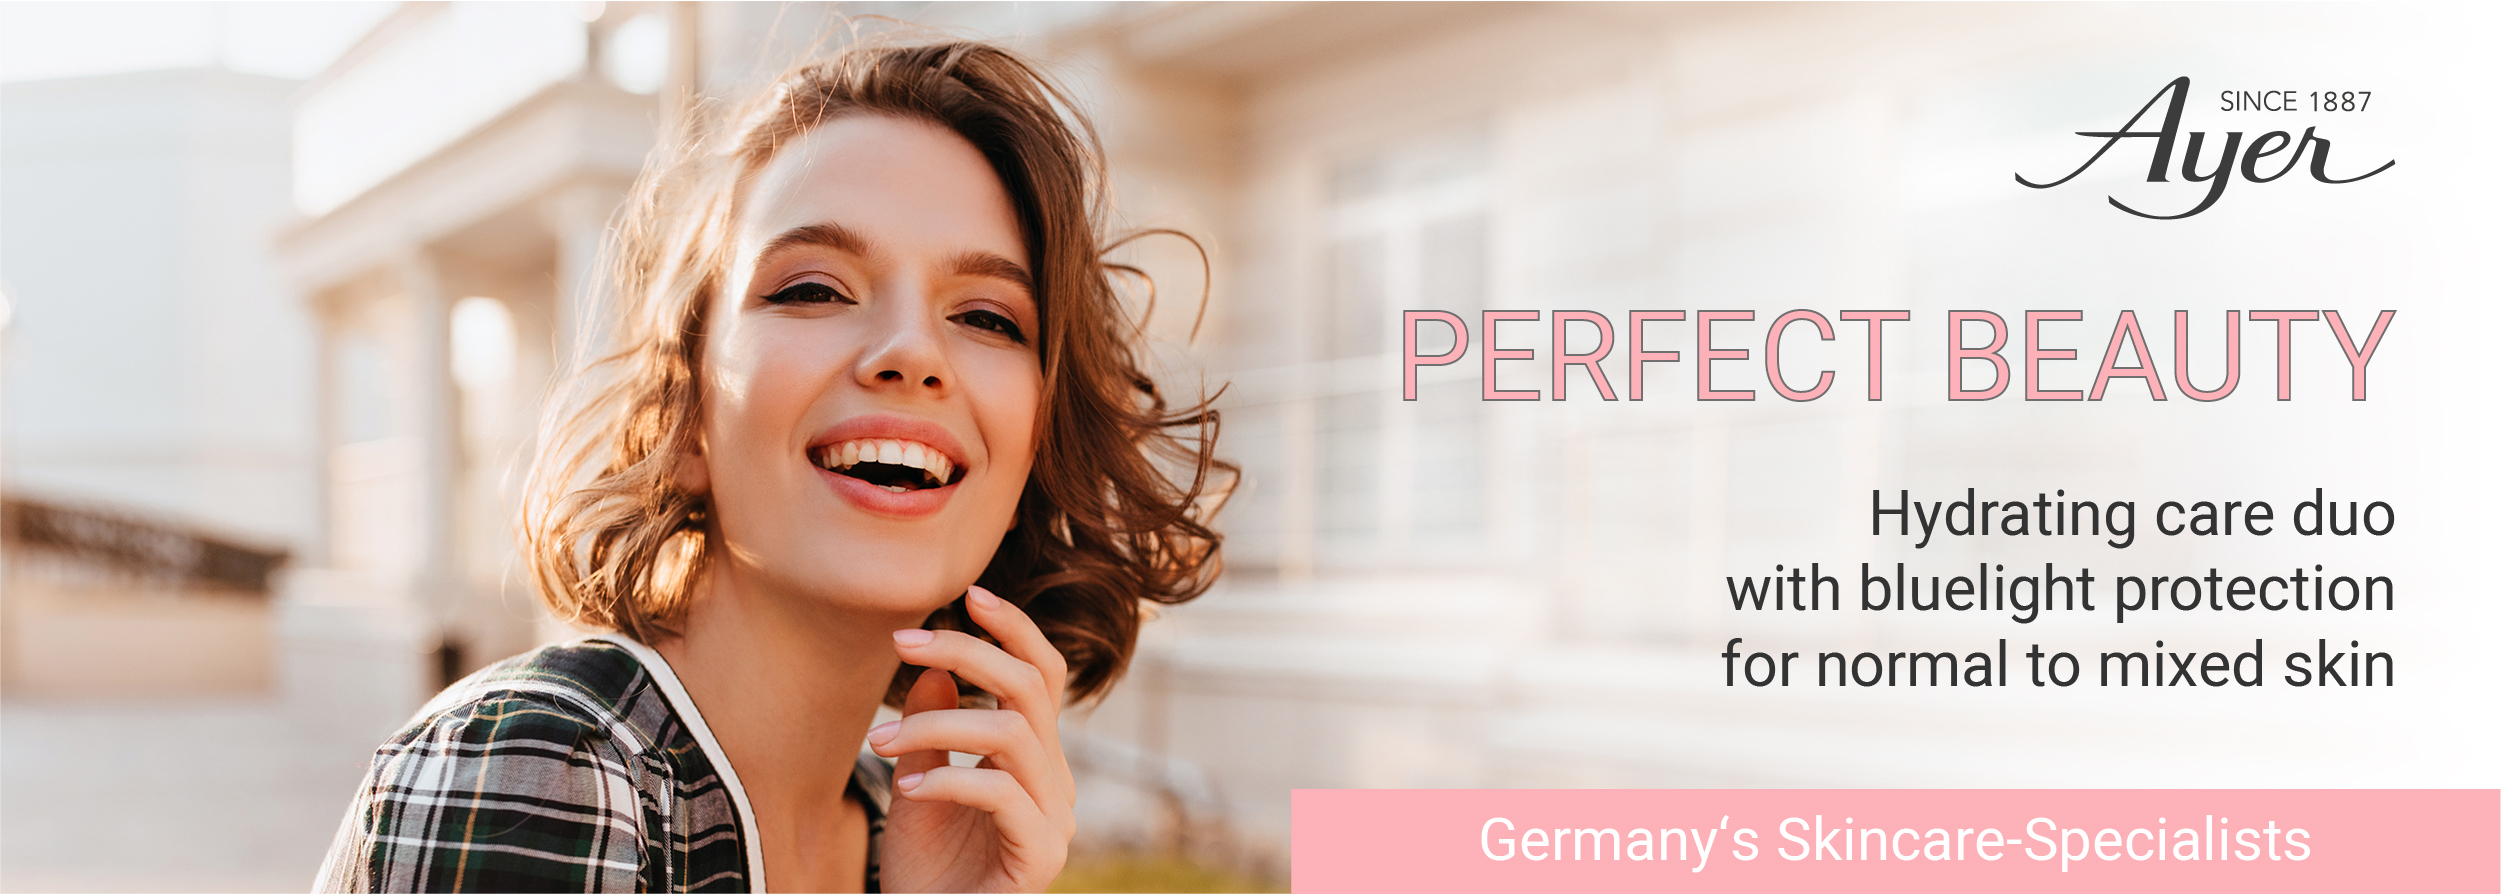 Ayer_Linien_PerfectBeauty_EN_Slider_2500x893px_RGB_V1-0_01-03-2021